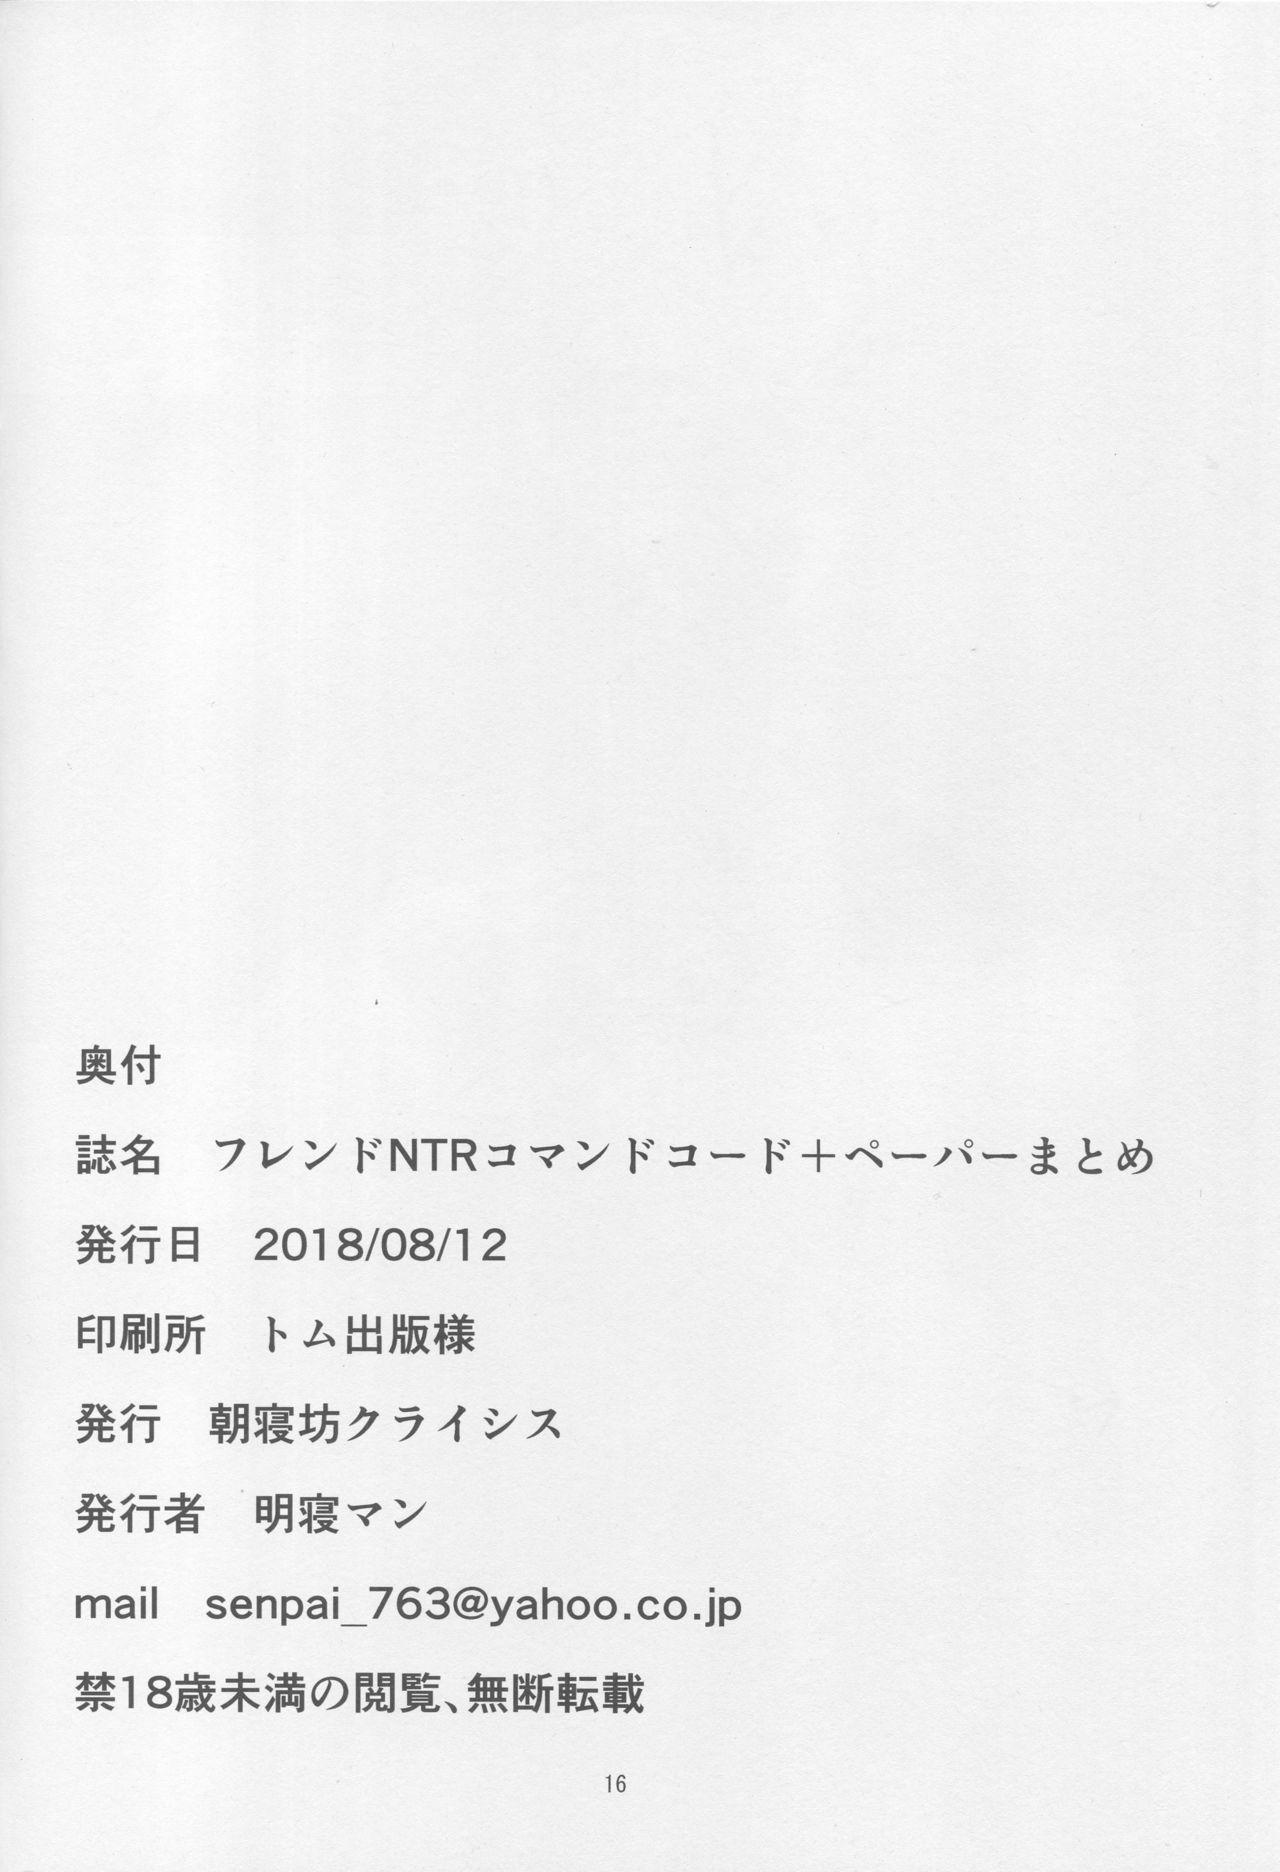 Friend NTR Command Code + Paper Matome 16